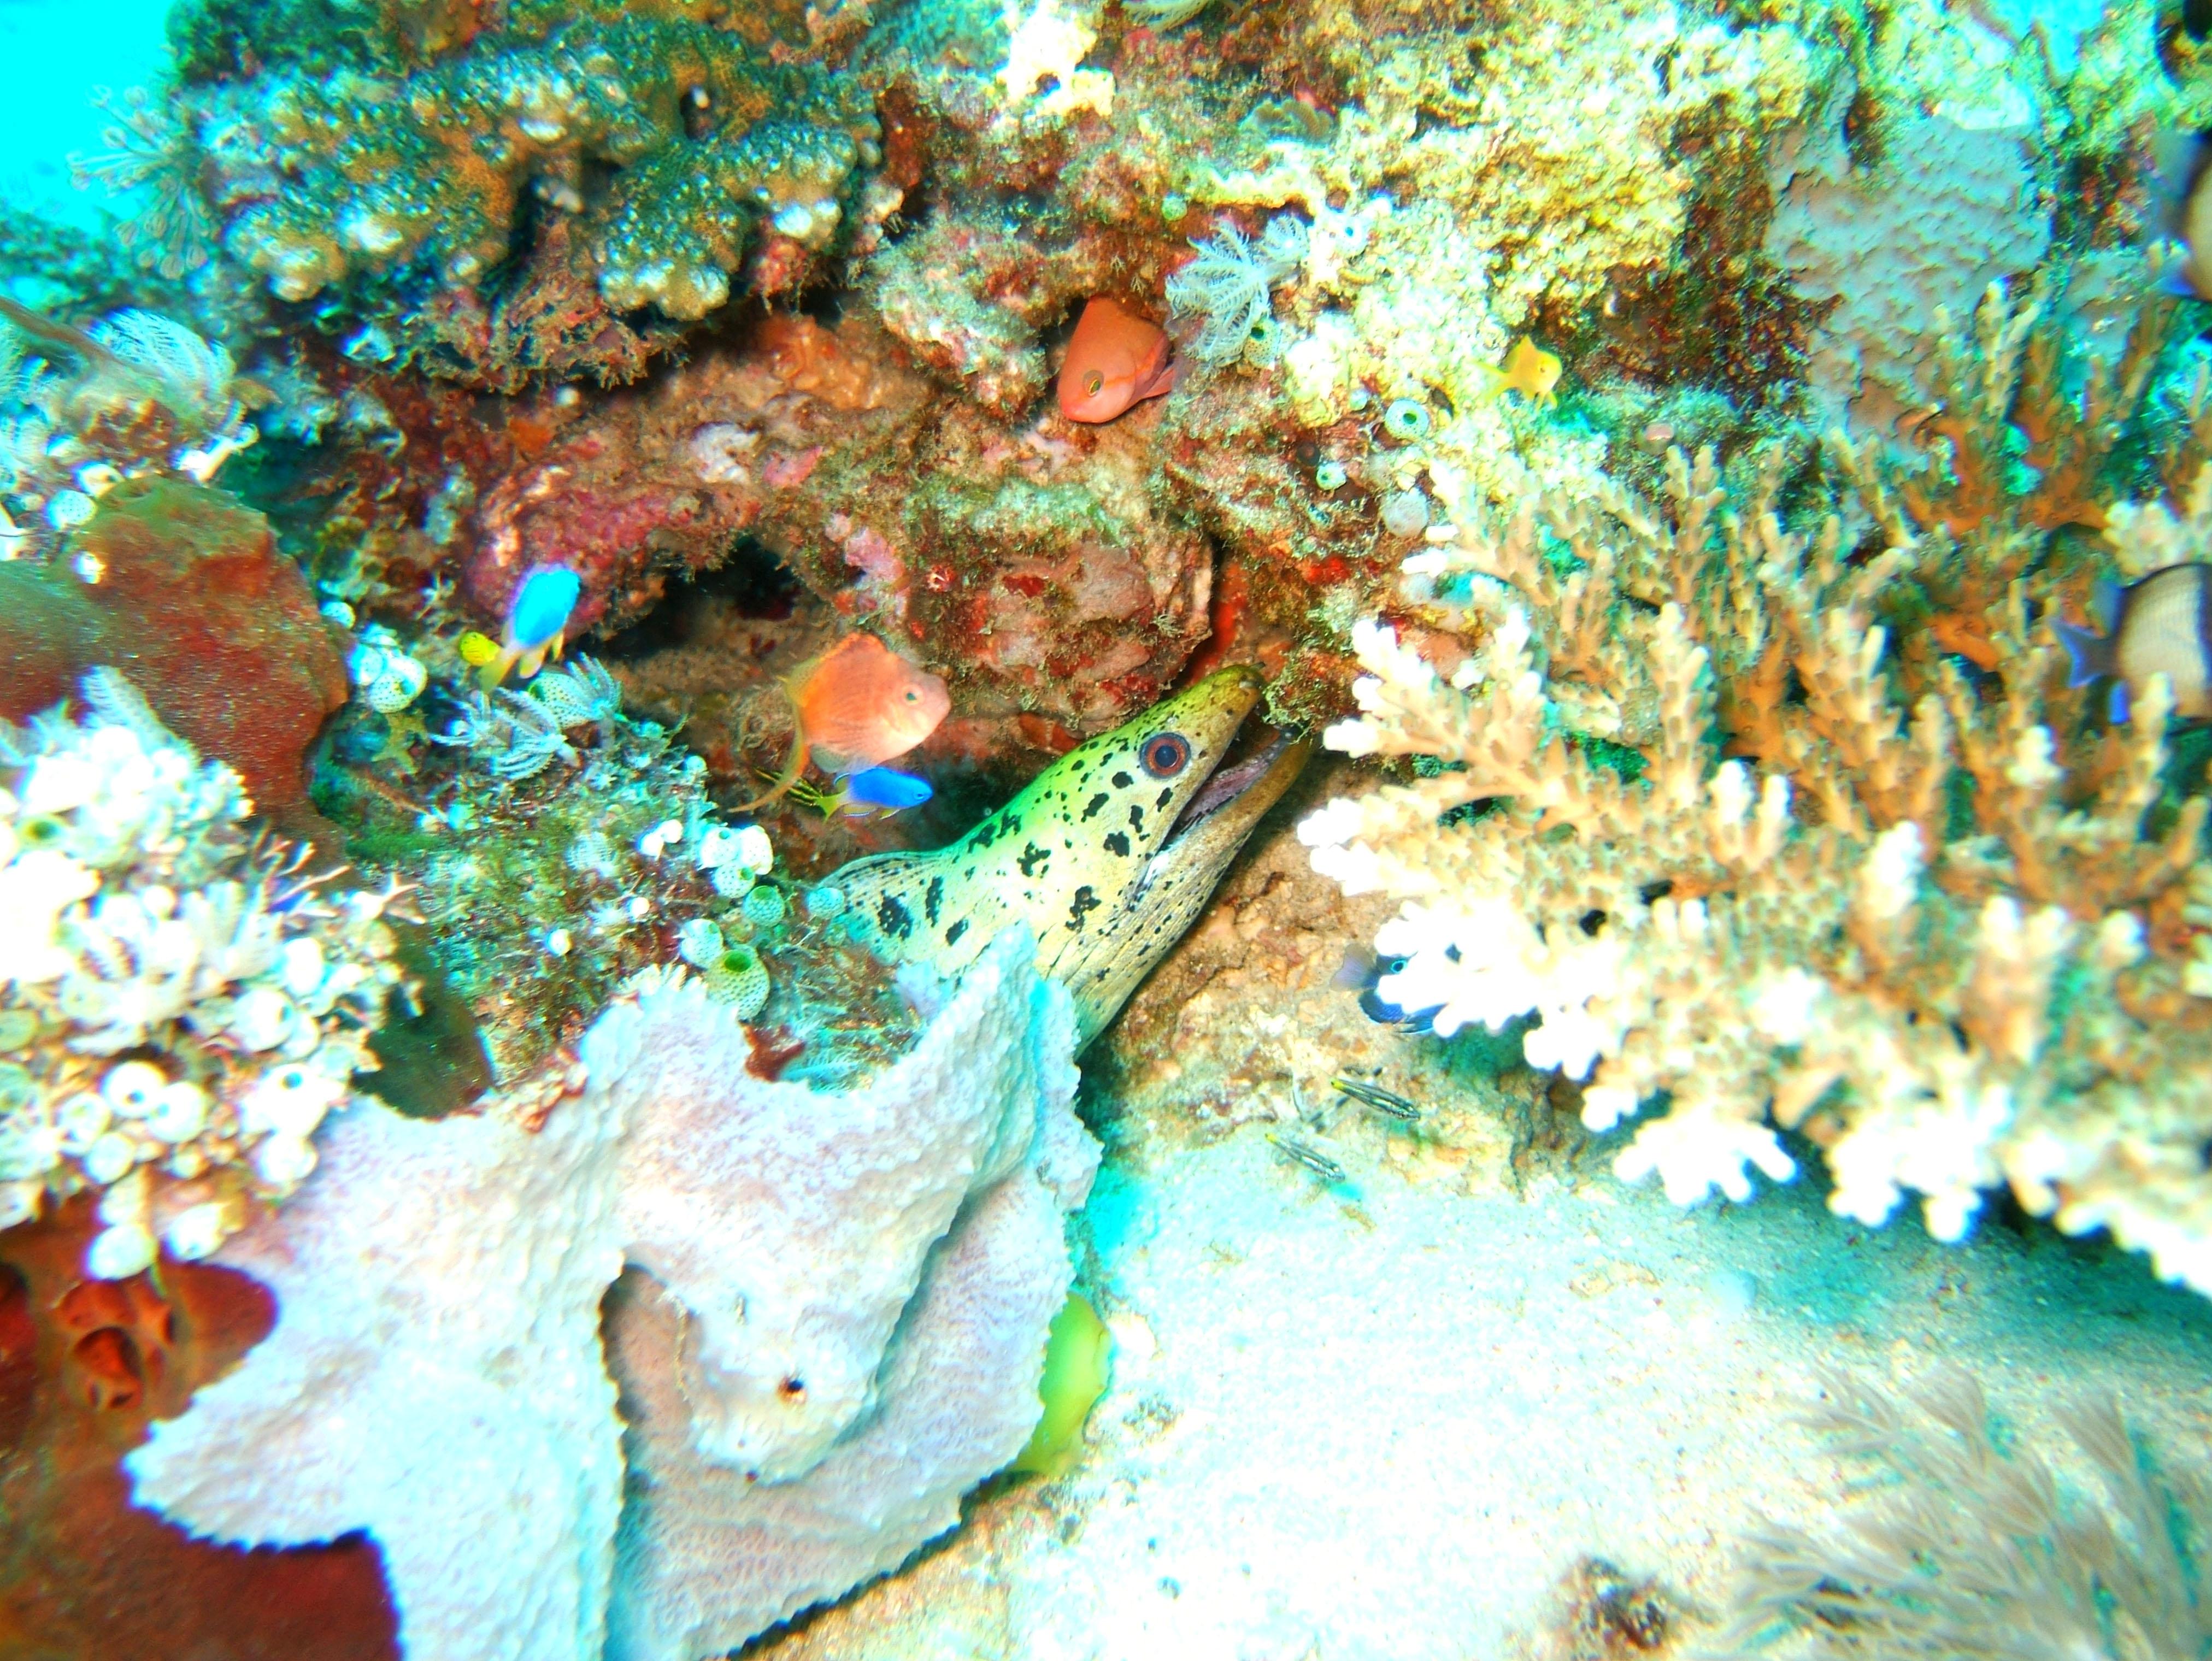 Dive 8 Philippines Mindoro Sabang Junk Nov 2005 62